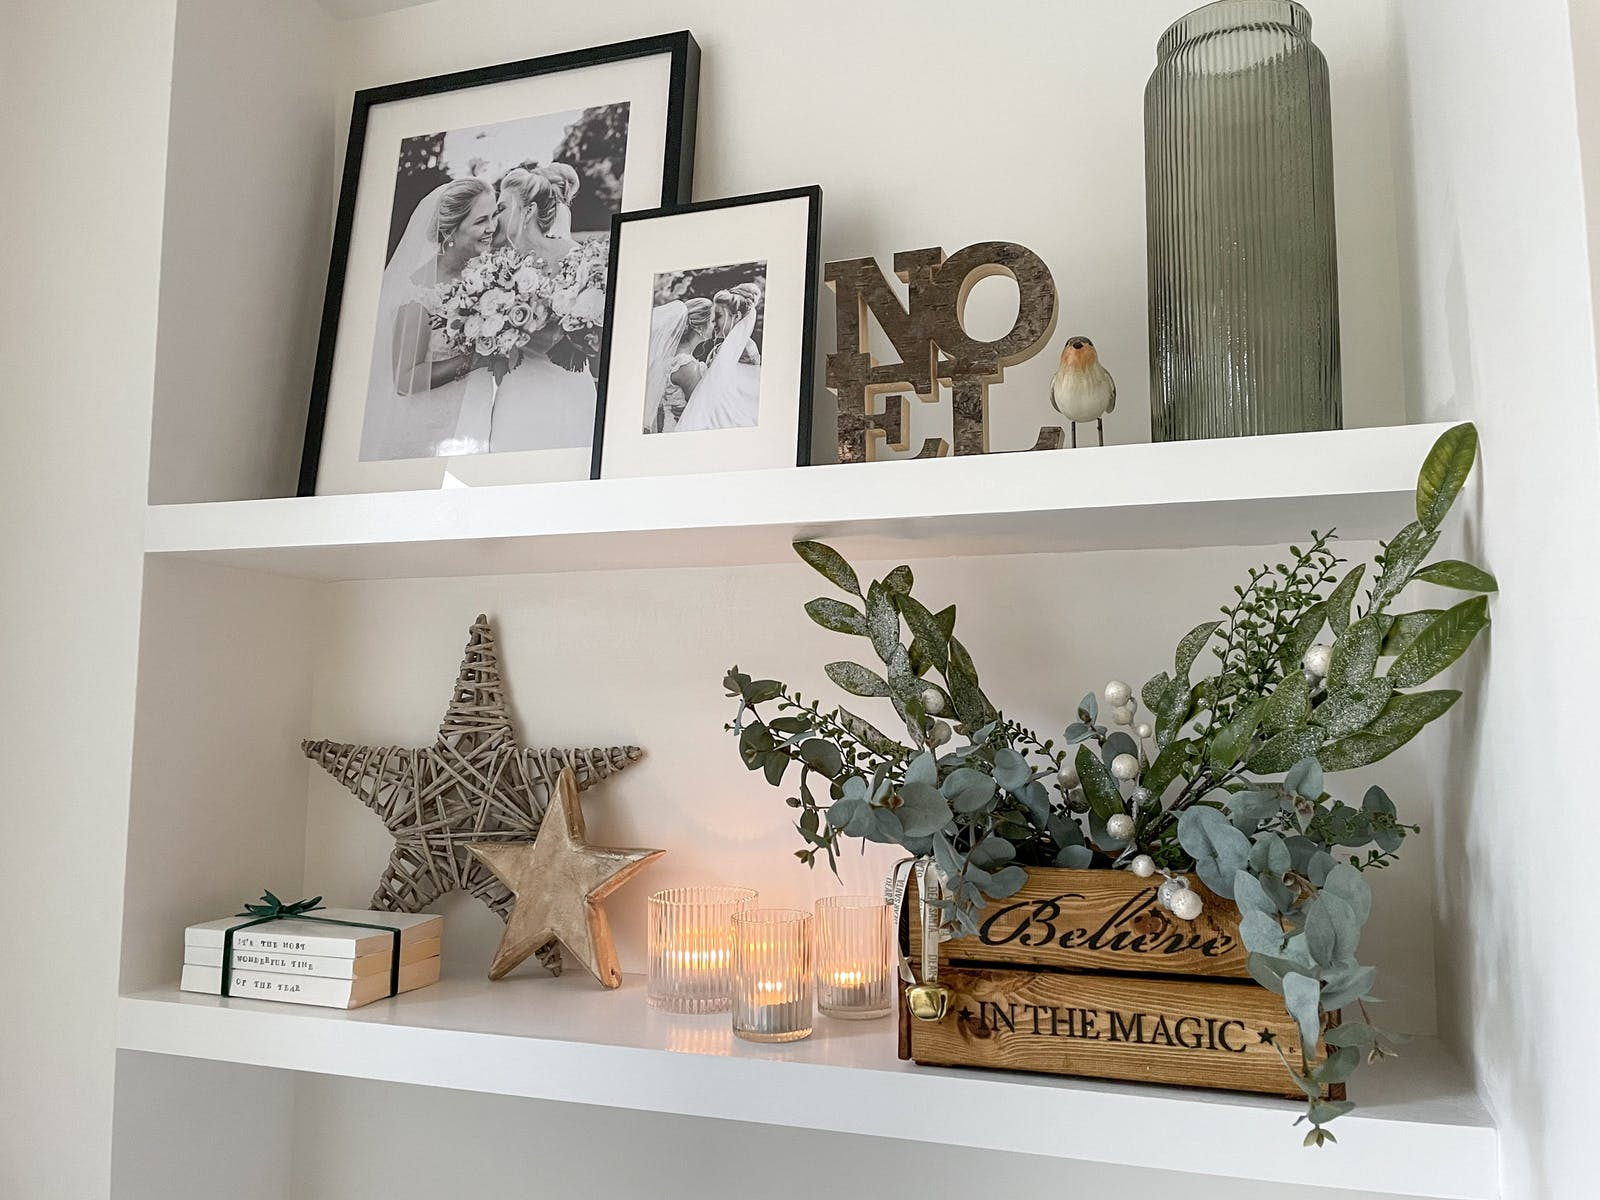 Chrismas decorations on a bookshelf